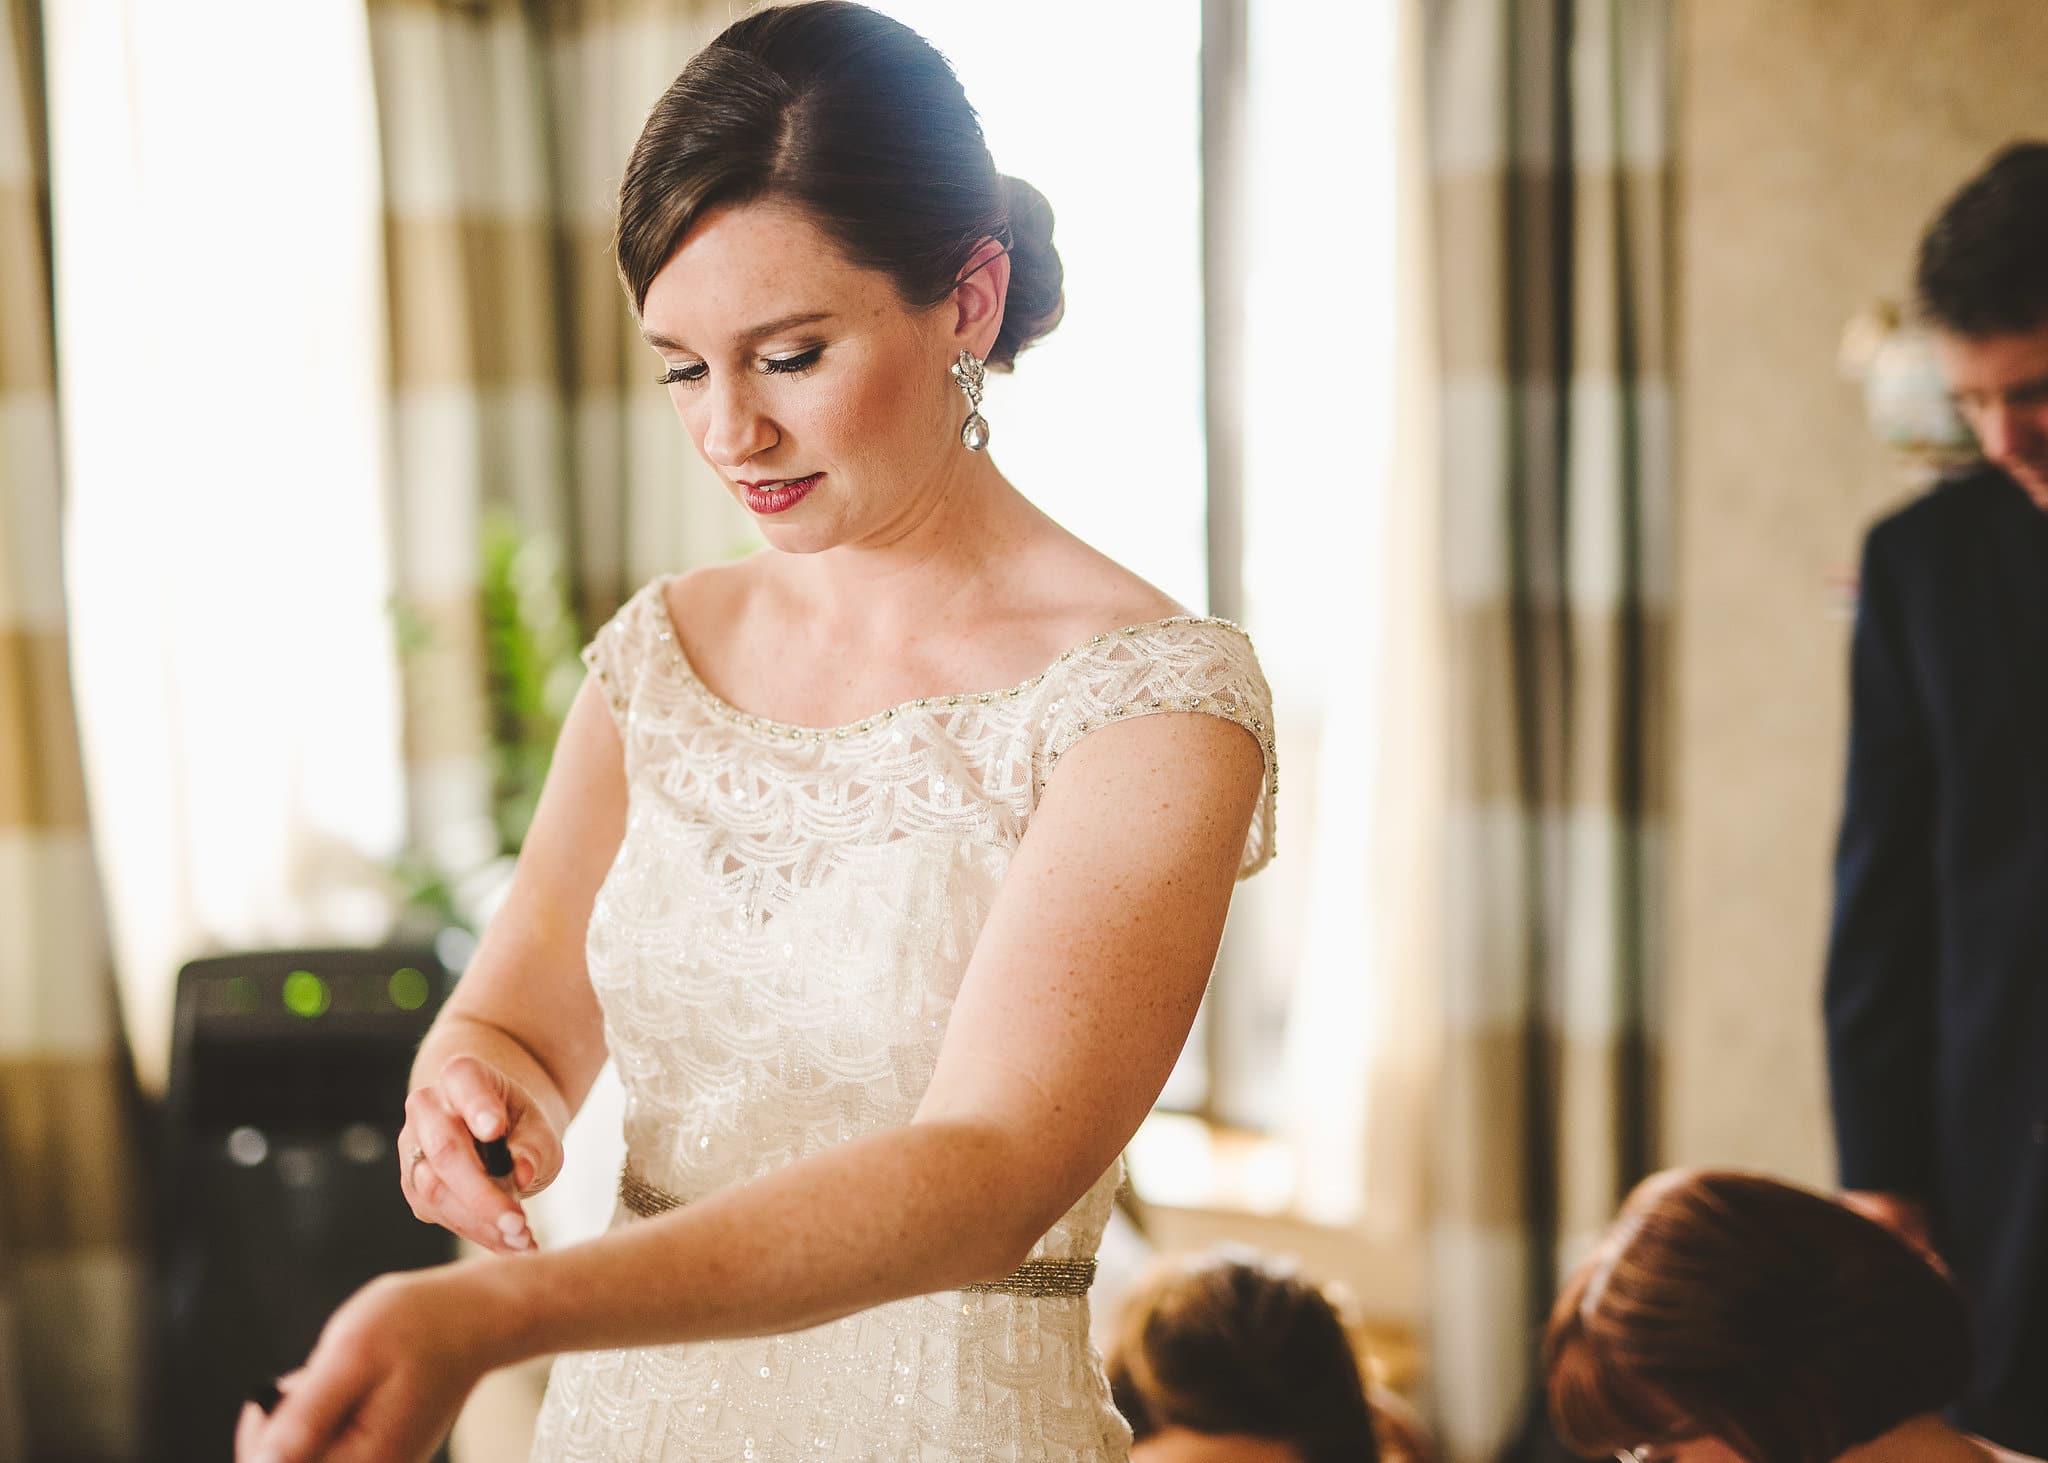 Bride spraying on her wedding perfume